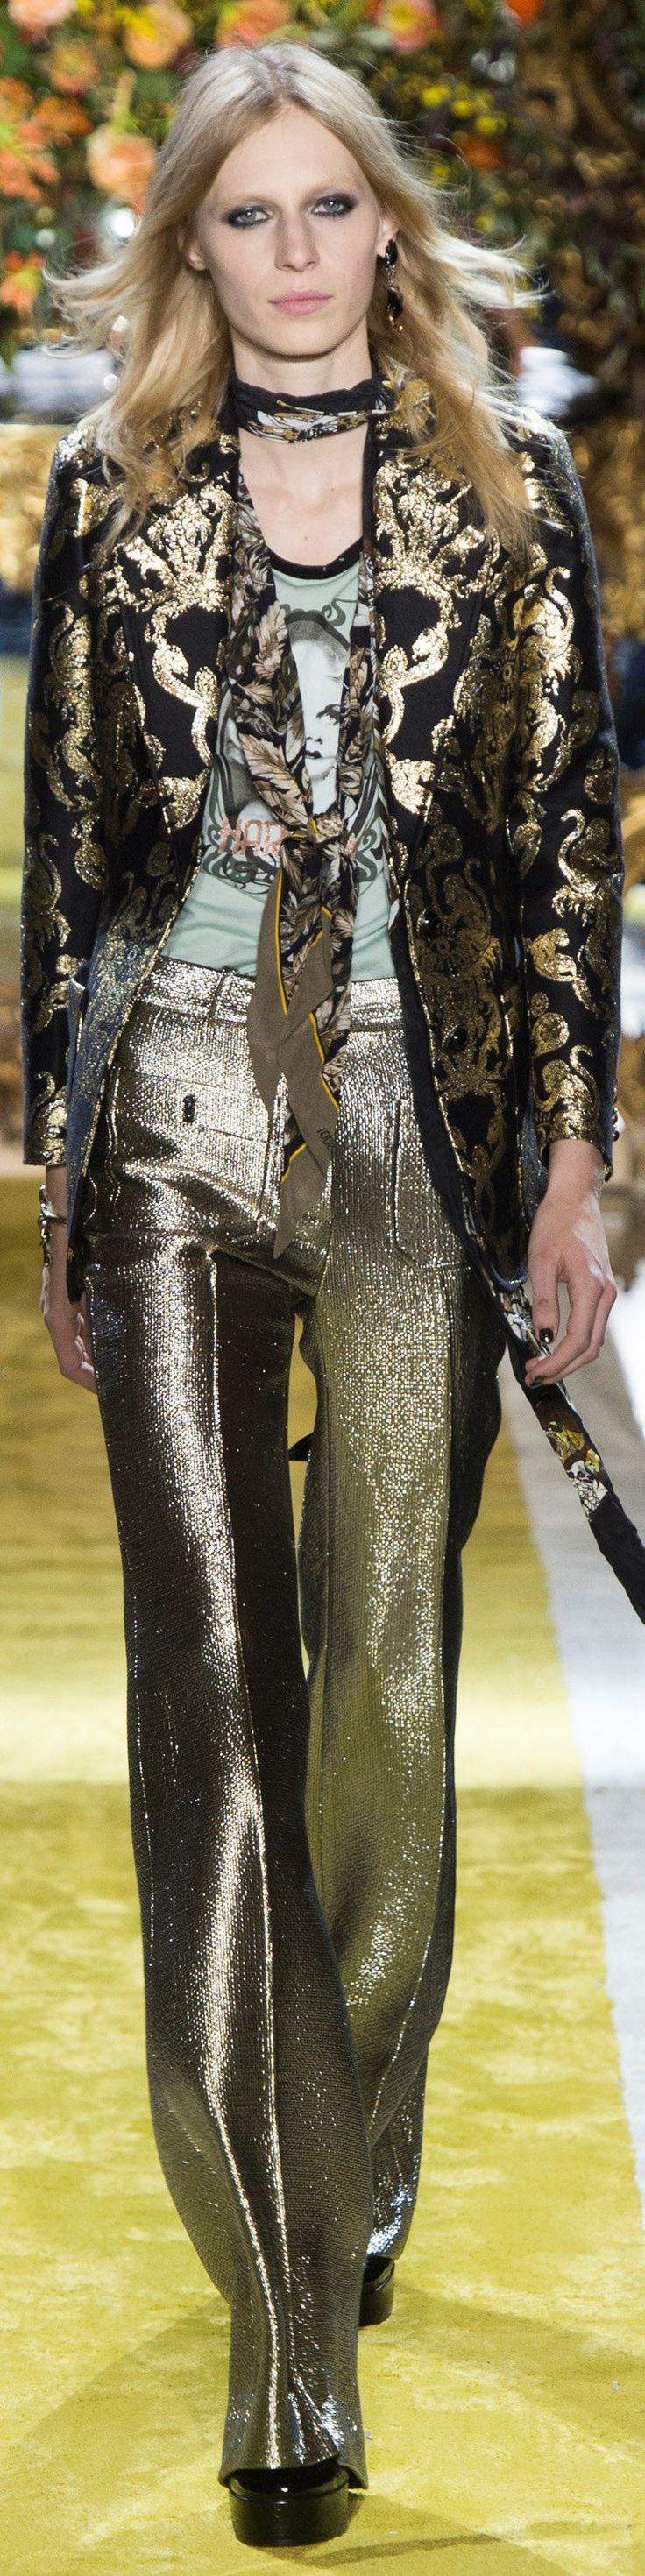 roberto cavalli fall 2016 ready to wear fashion star